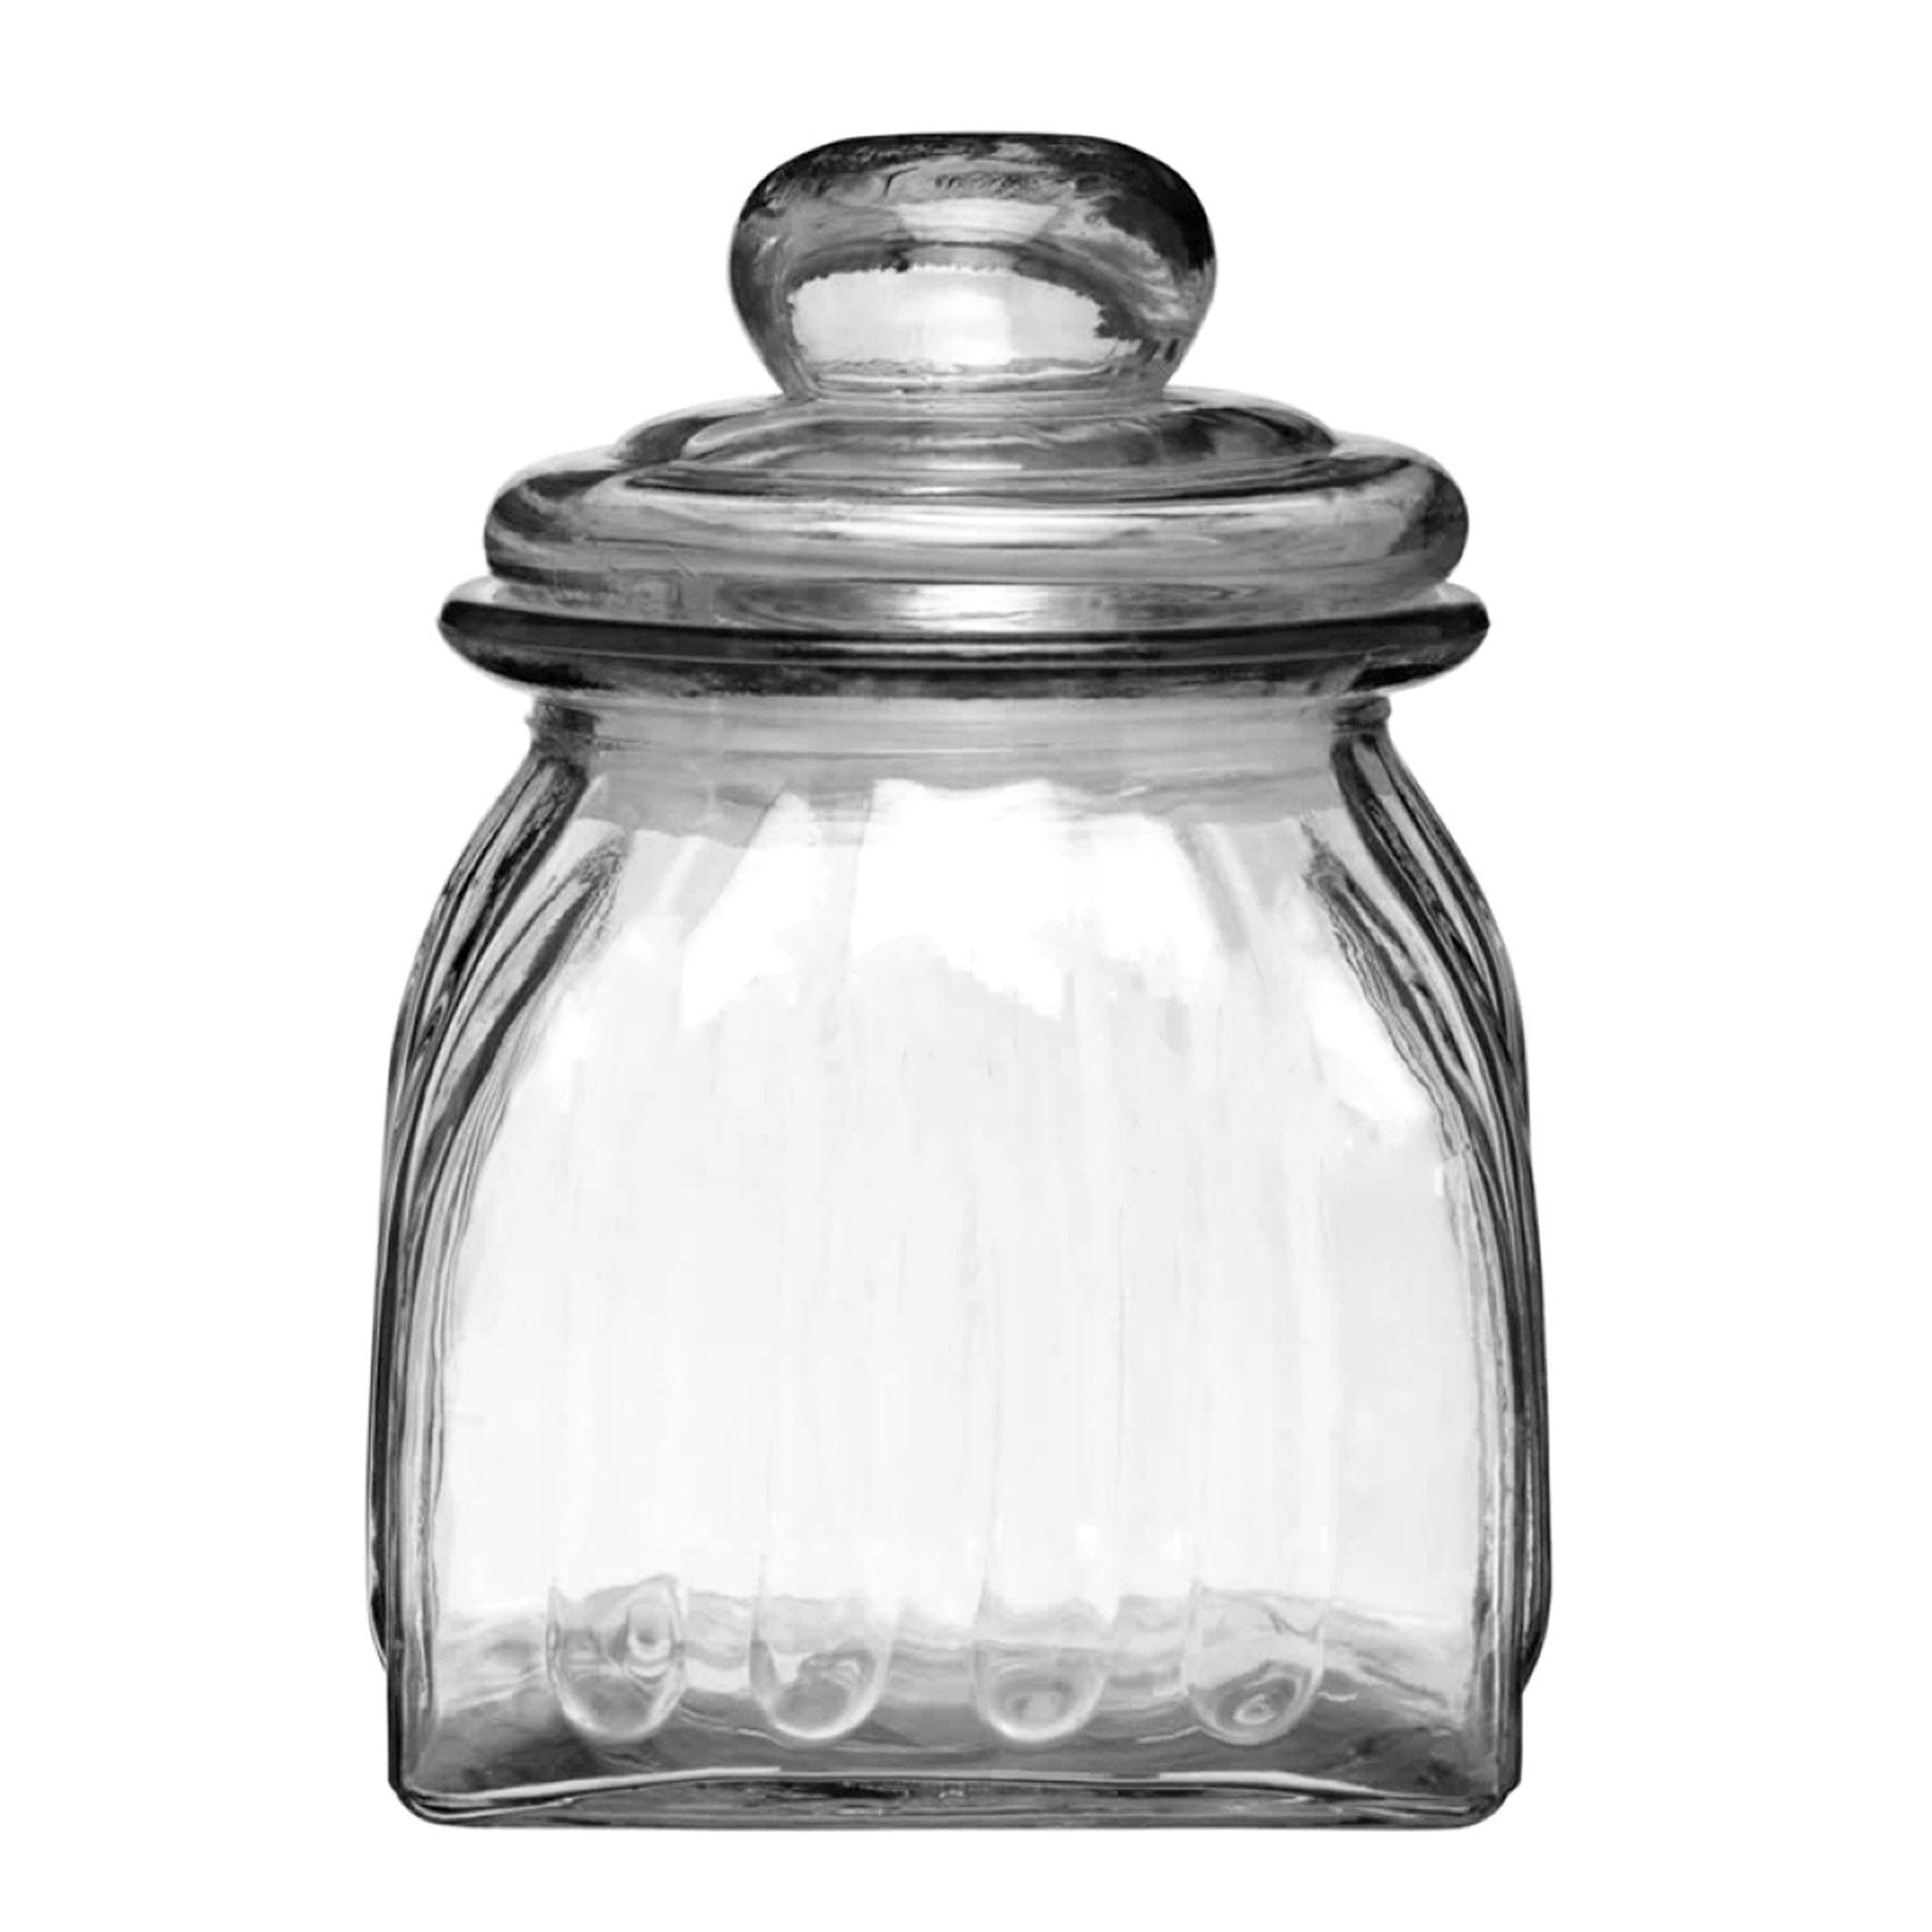 Homemade Vintage Style Glass Storage Jar 0.67ltr